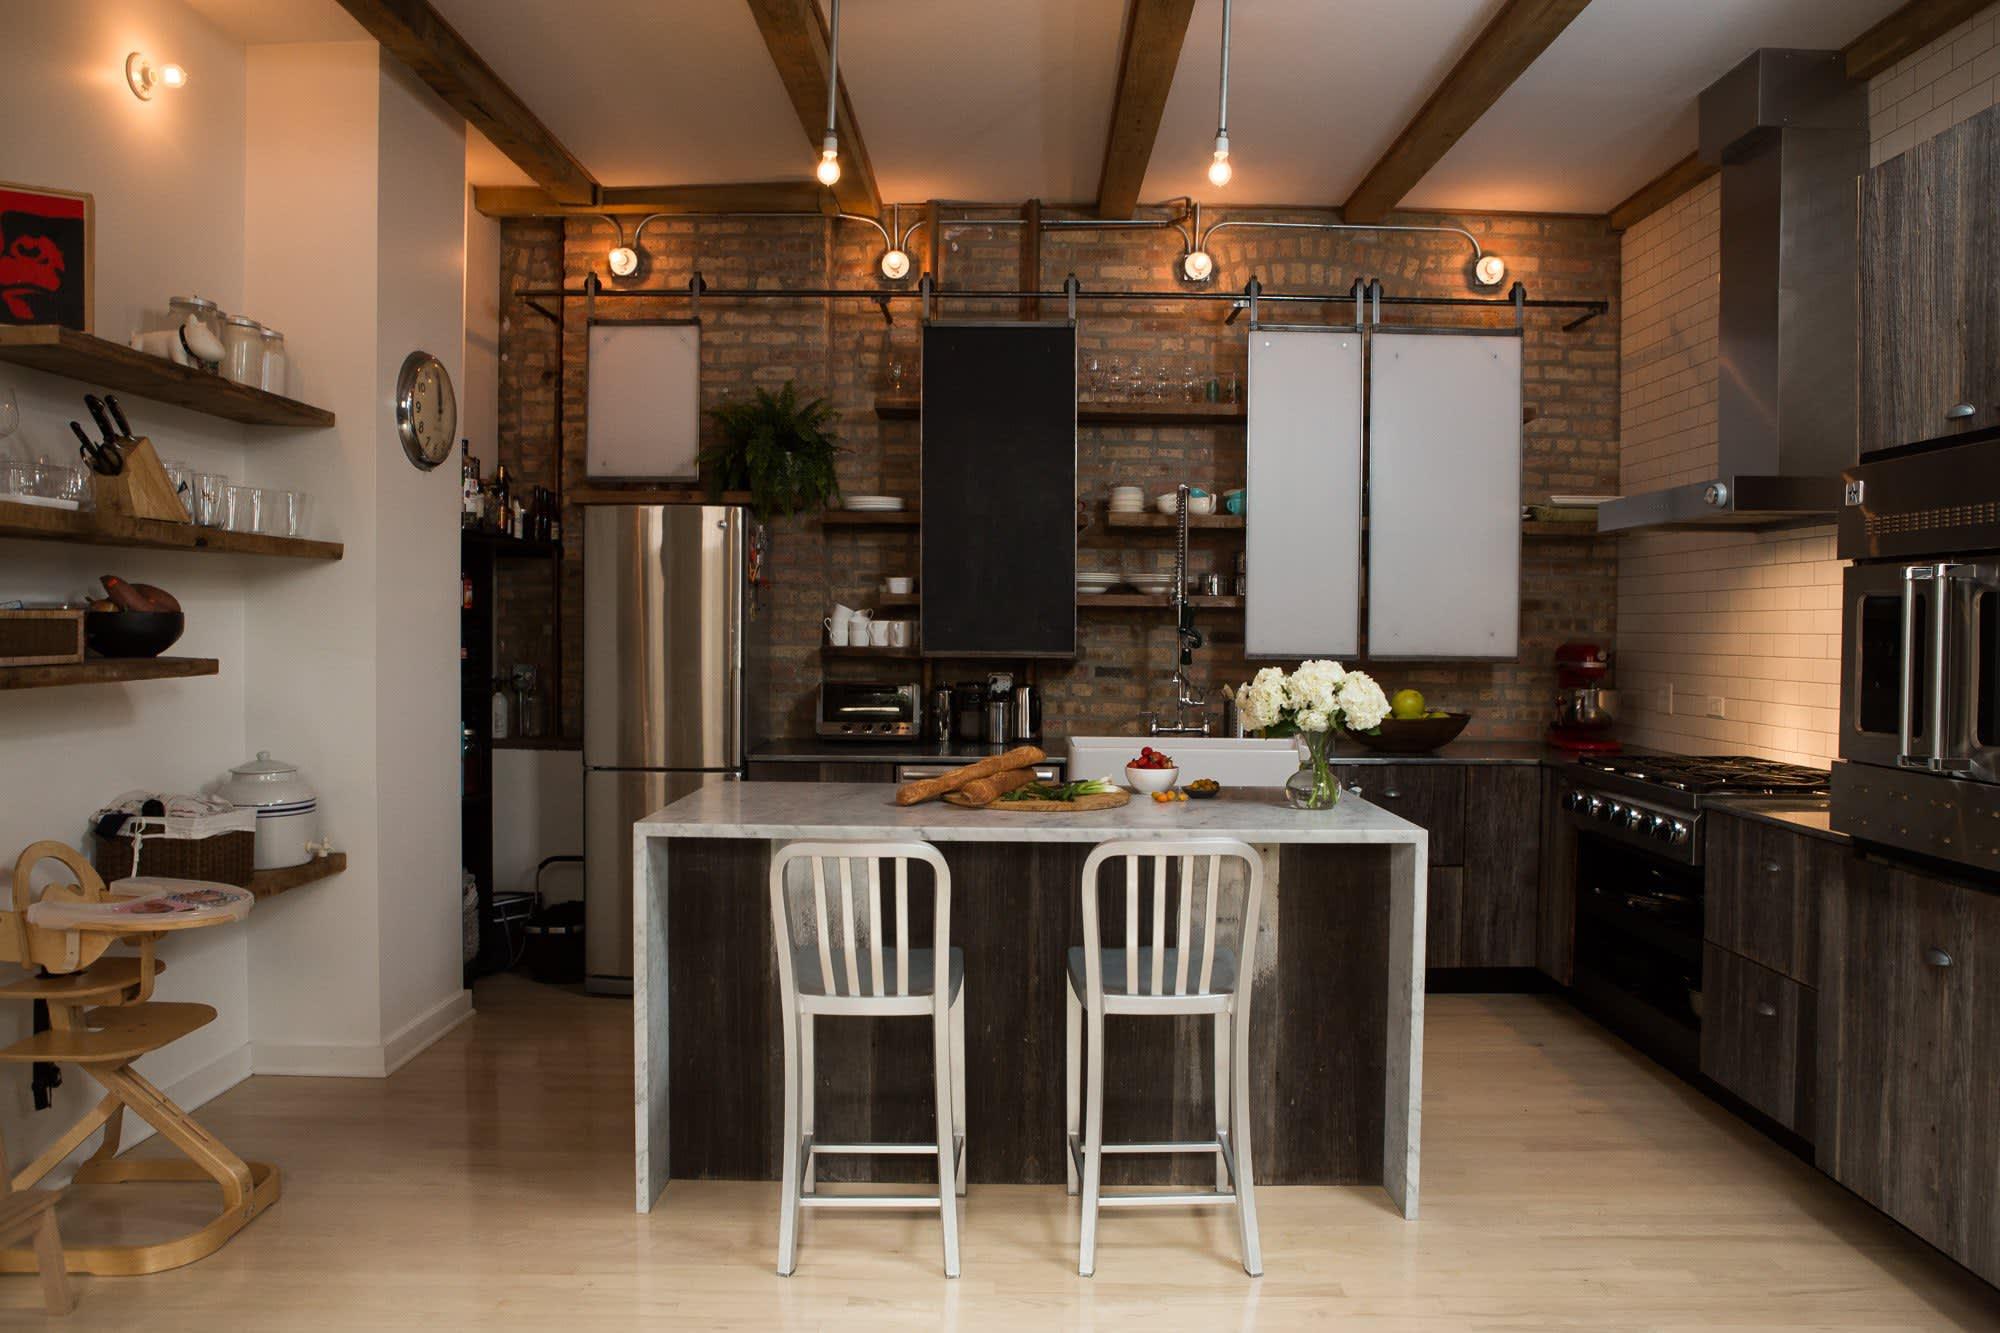 Ellen & Greg's Renovated Loft Kitchen: gallery image 2